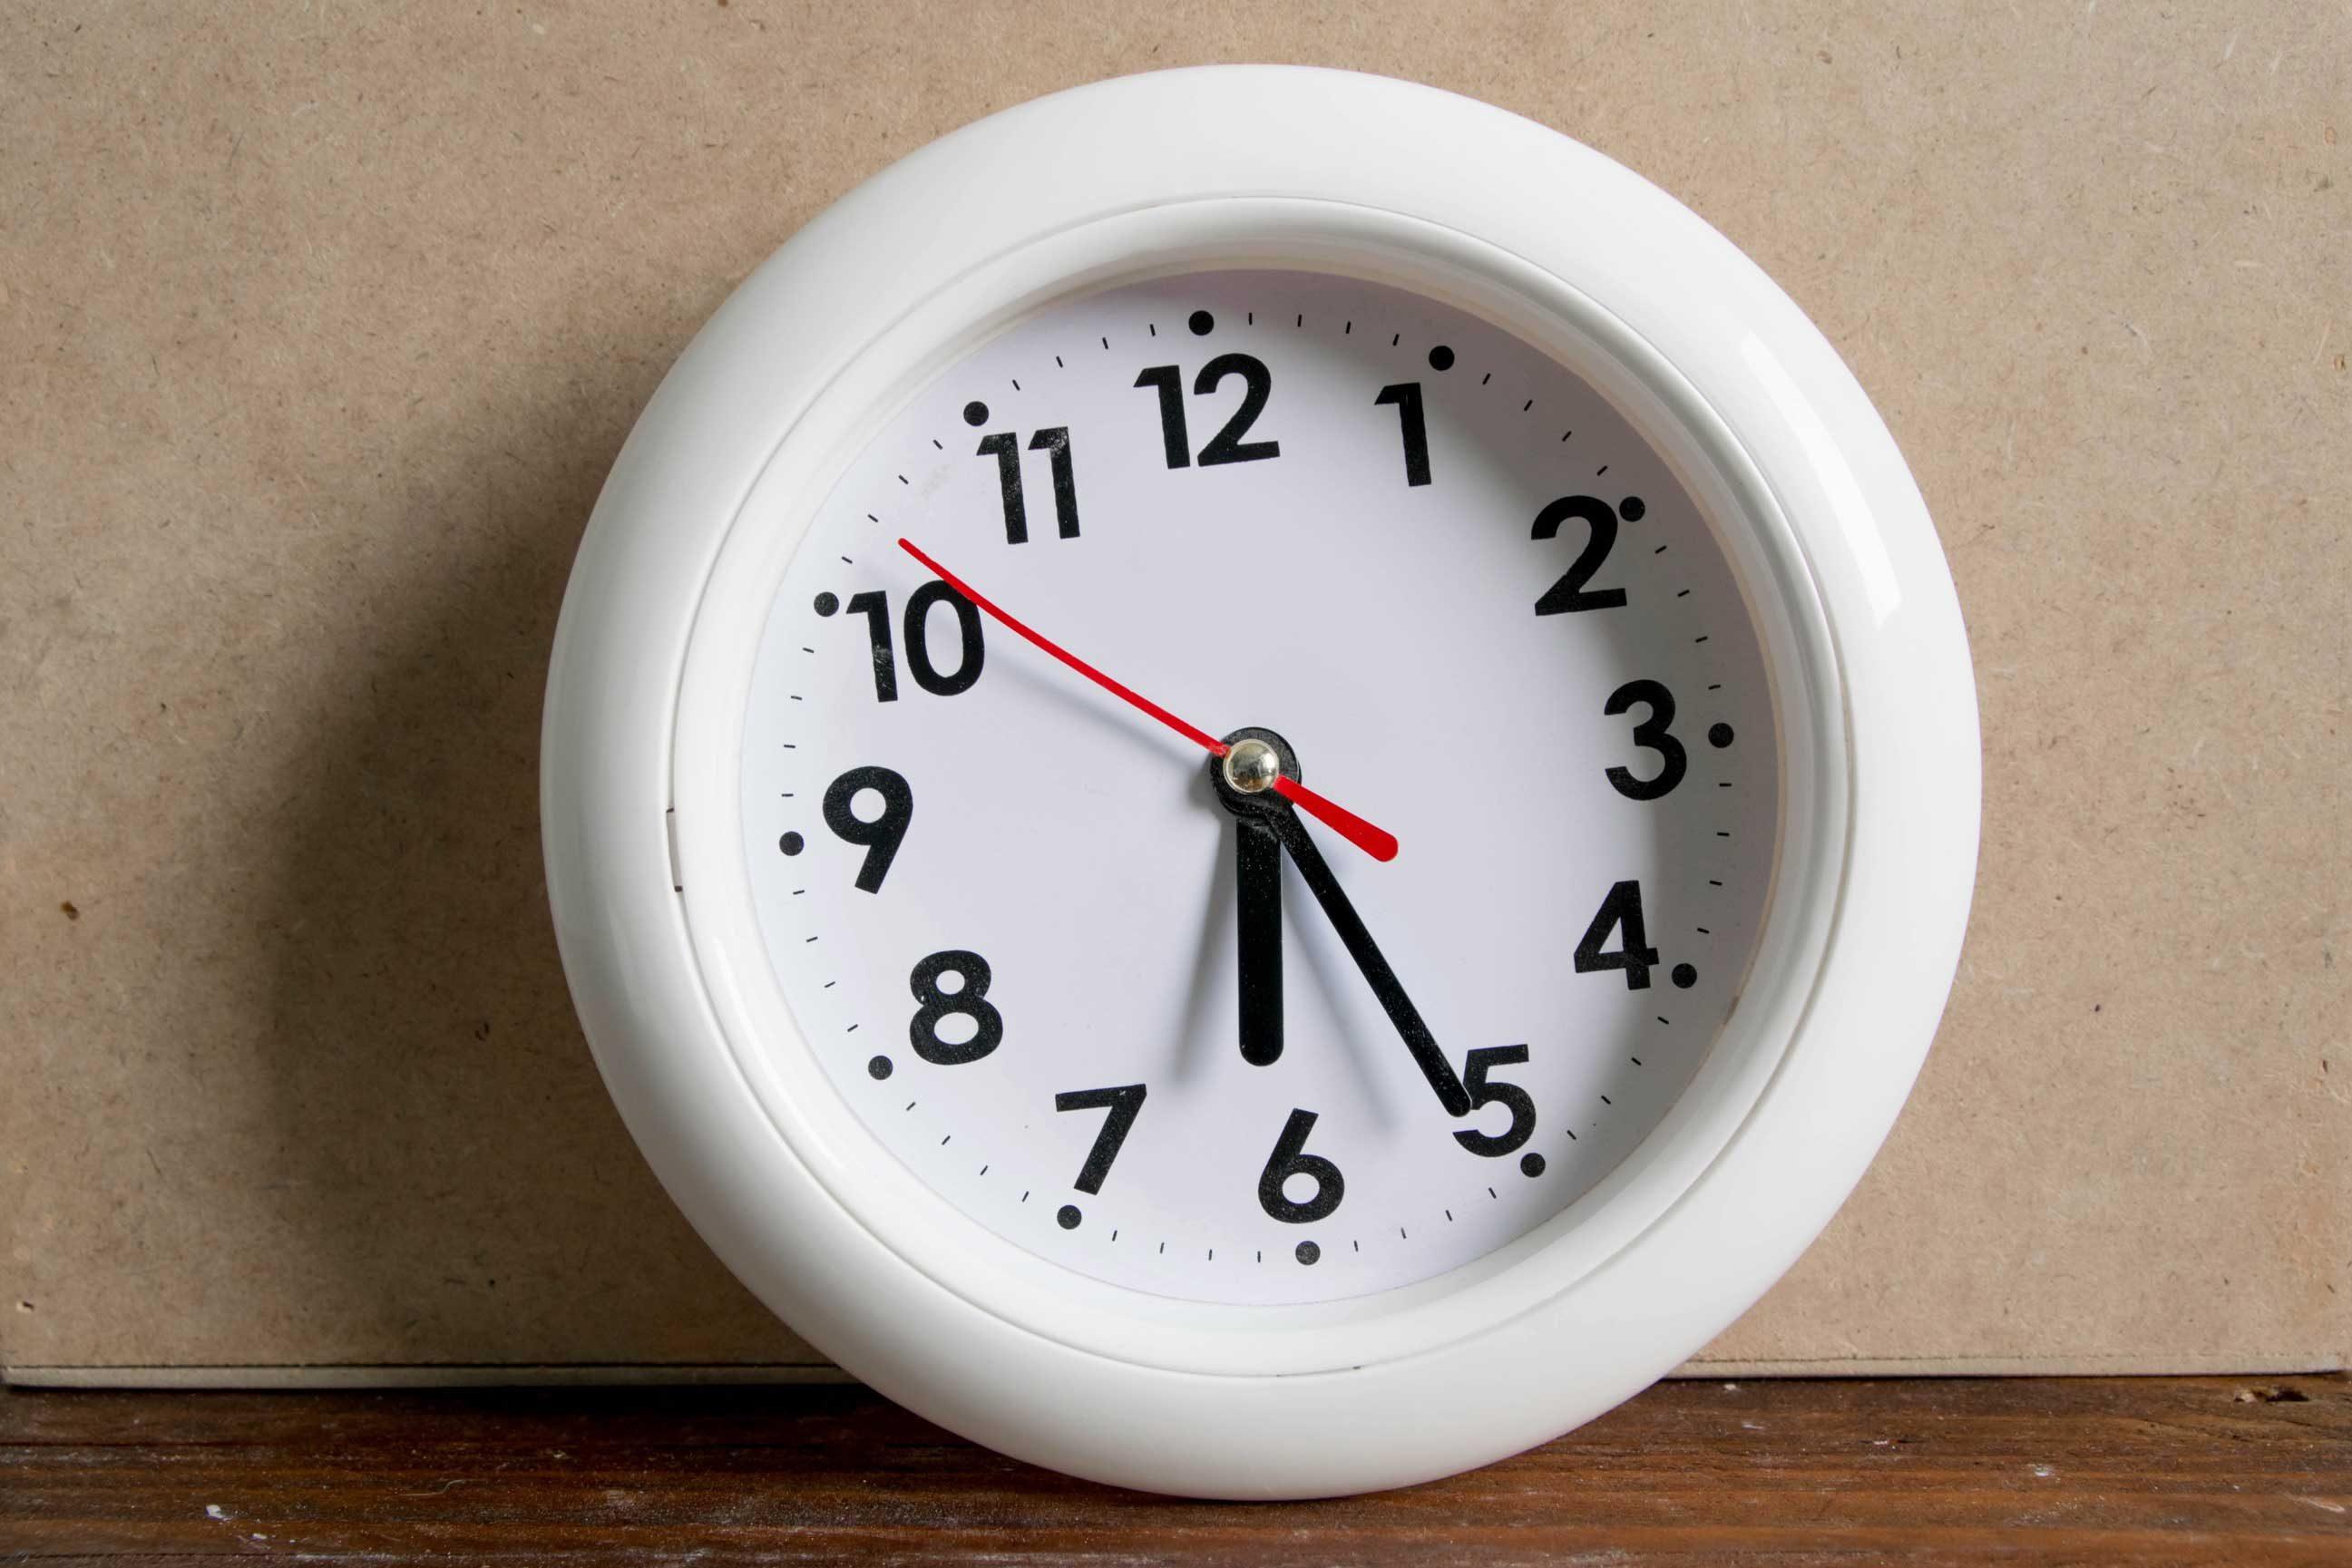 Make a sleep schedule